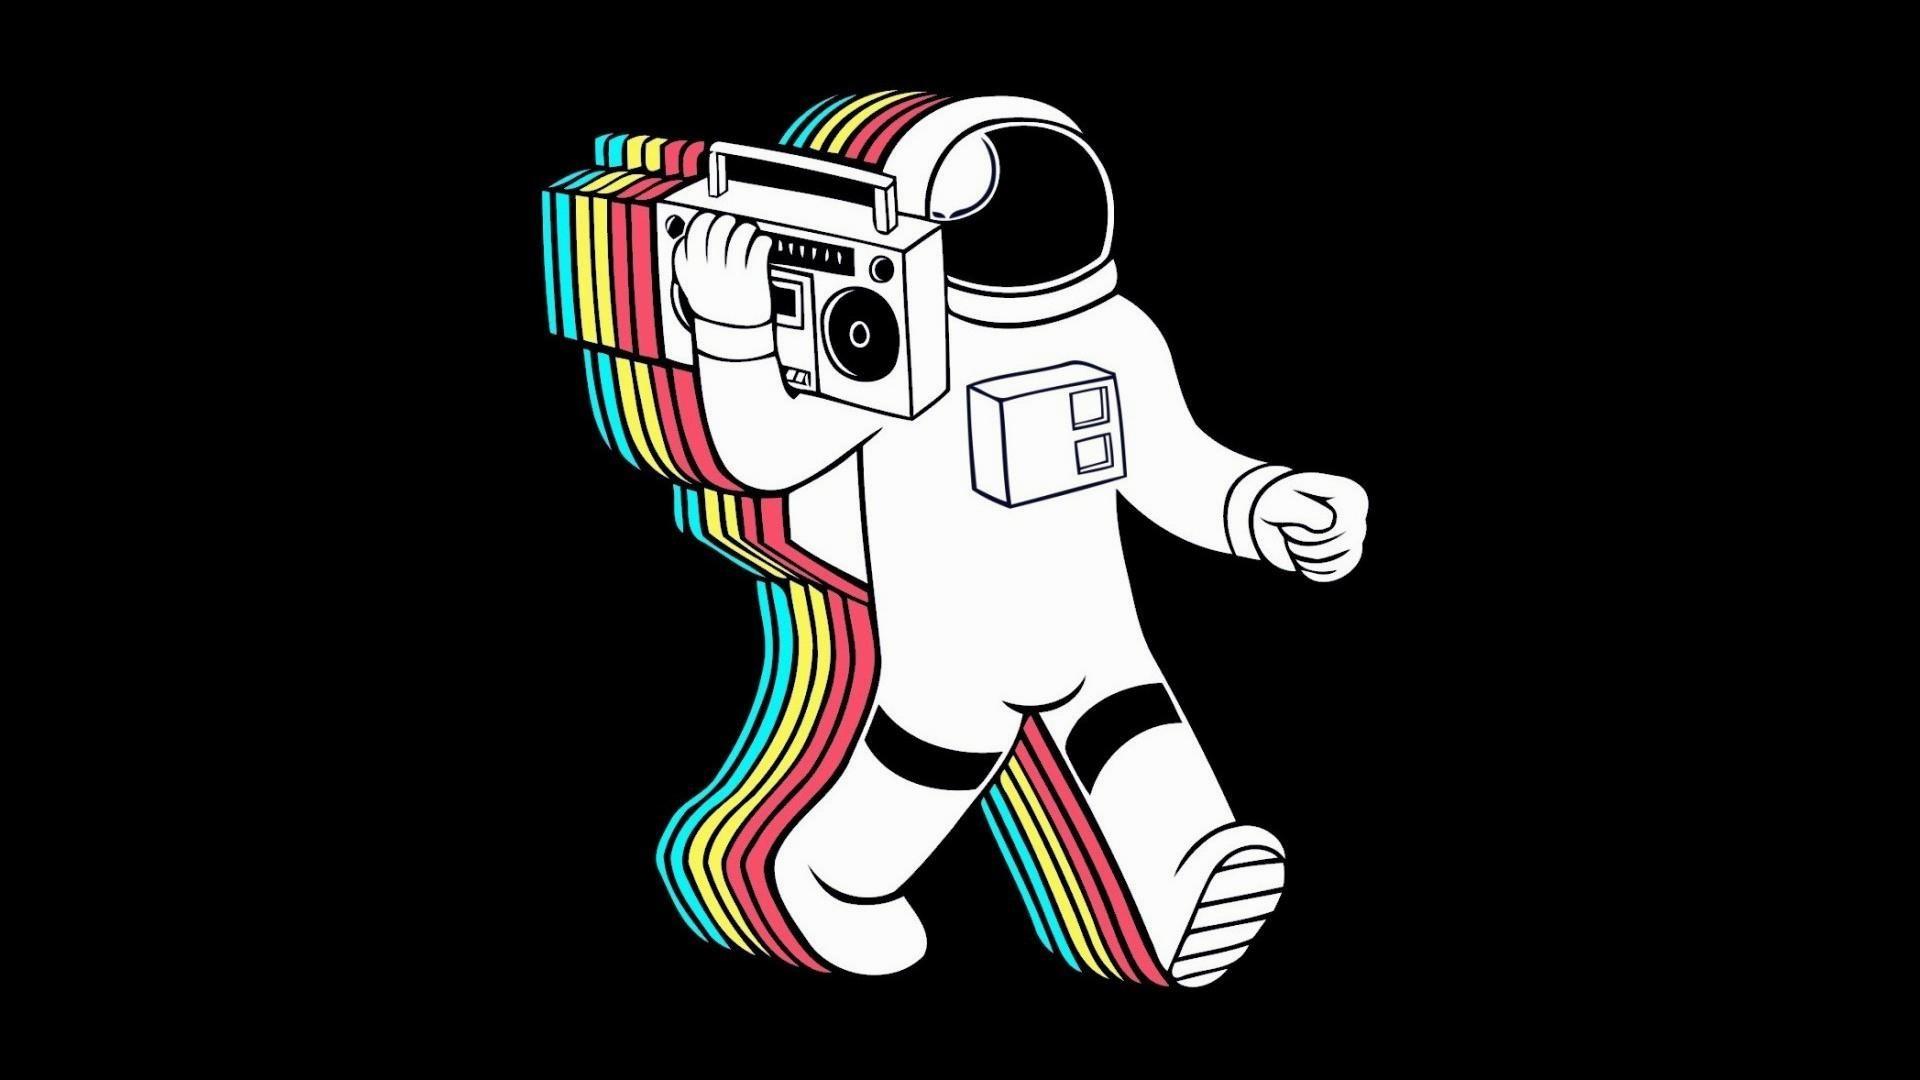 wallpaper.wiki-Astronaut-Photo-HD-PIC-WPD0013891